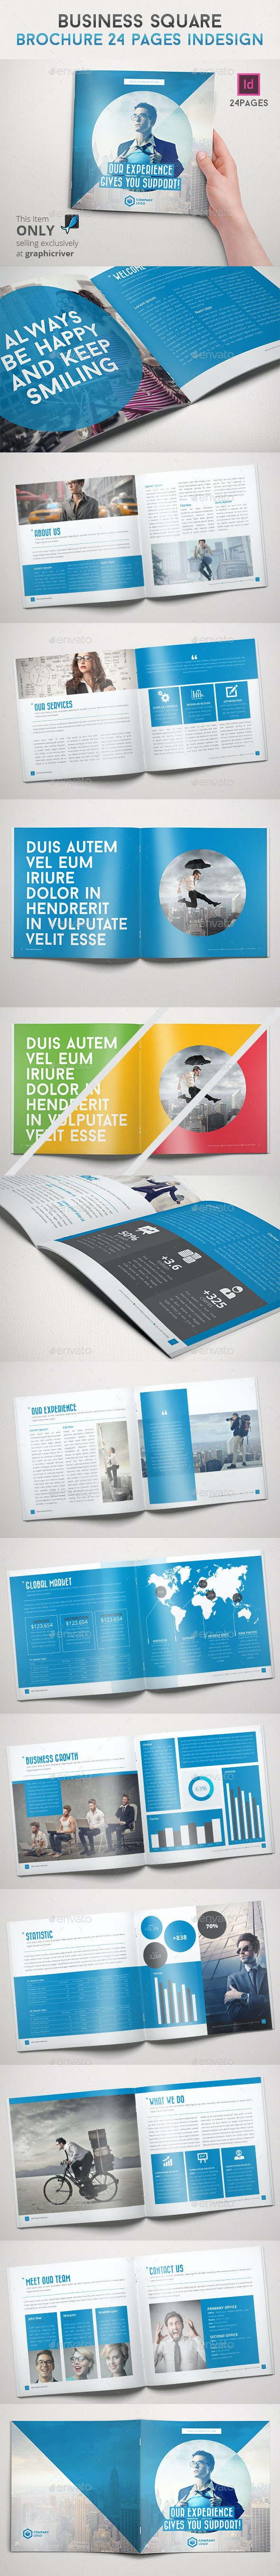 Business Square Brochure 24 Pages Indesign - Informational Brochures